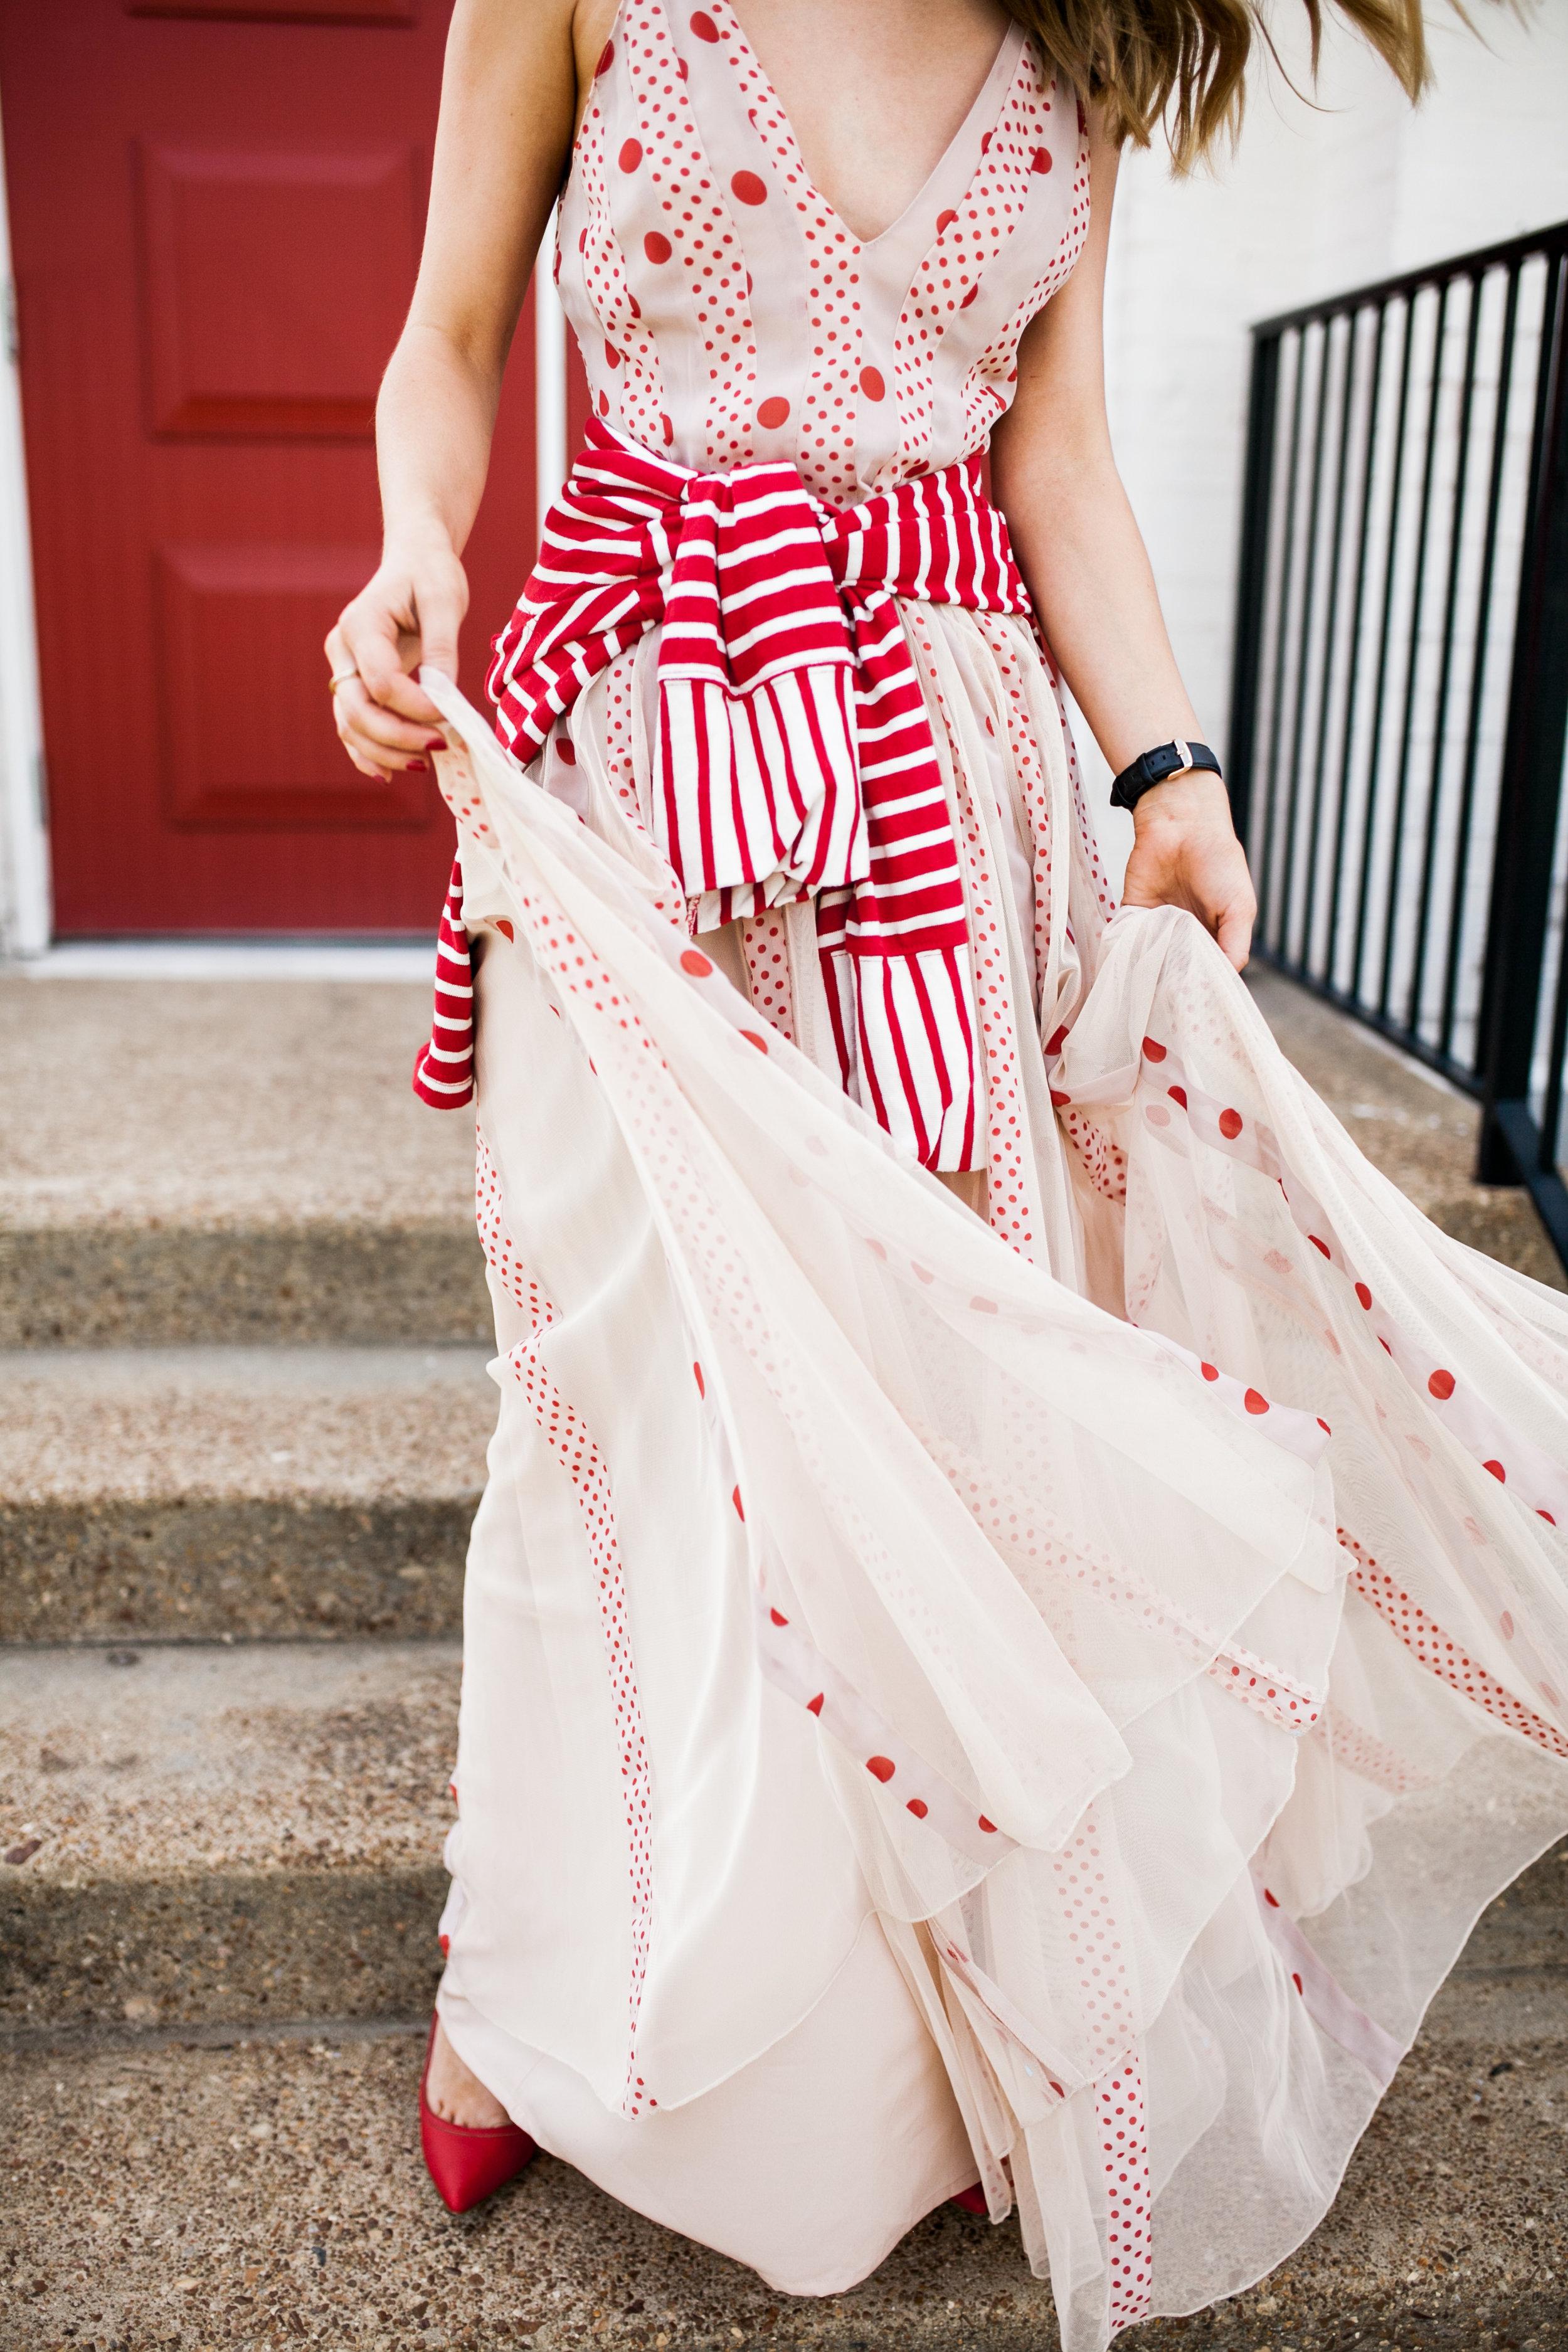 nude-and-red-polka-dot-maxi-dress.jpg